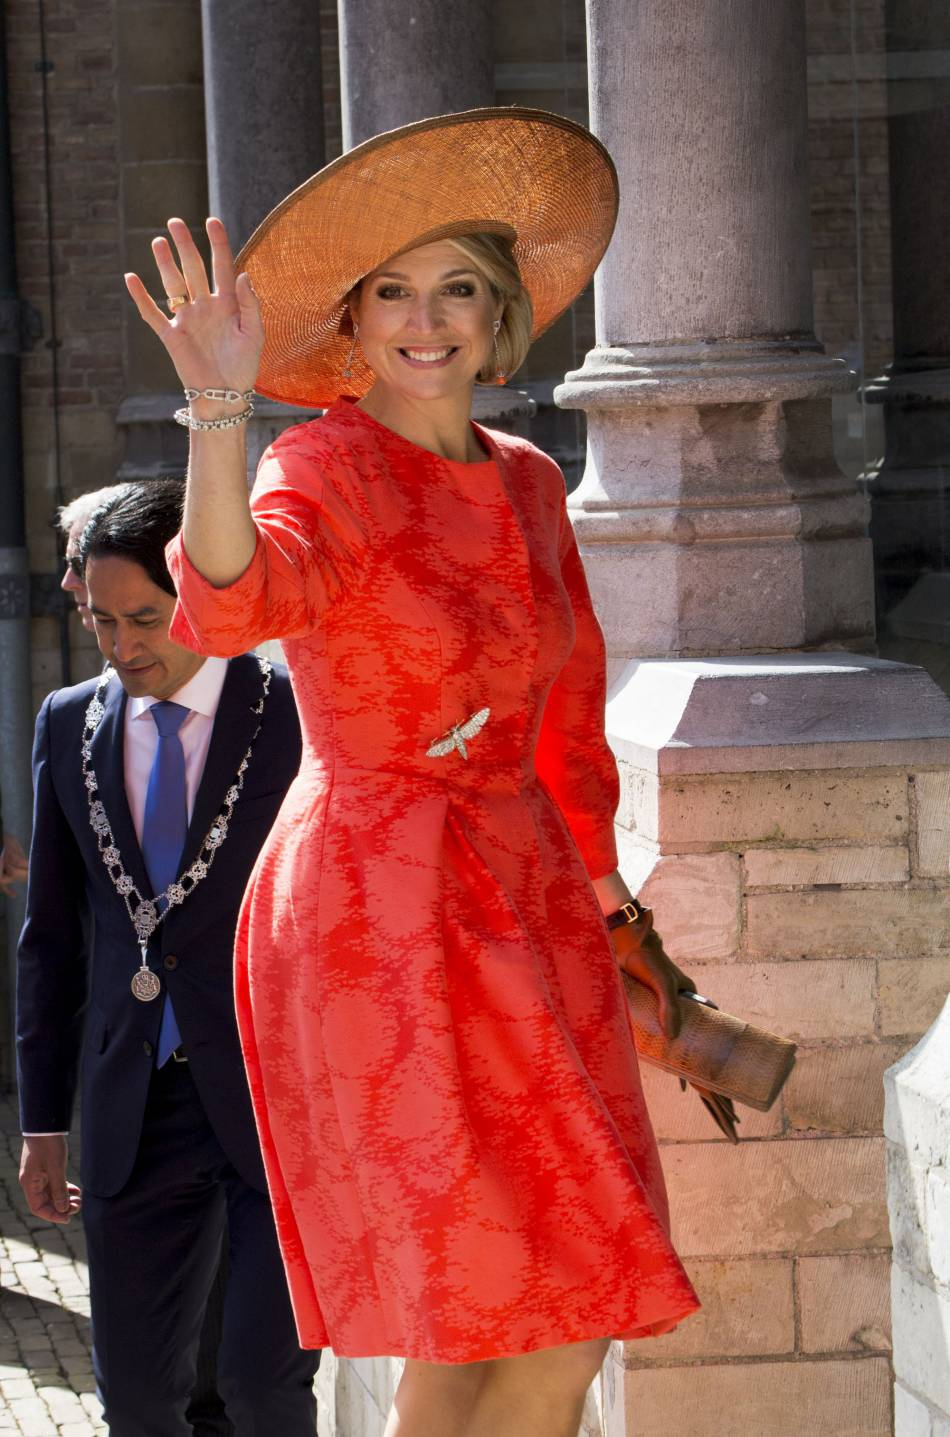 La reine Maxima a offert une apparition vitaminée jeudi 21 avril.